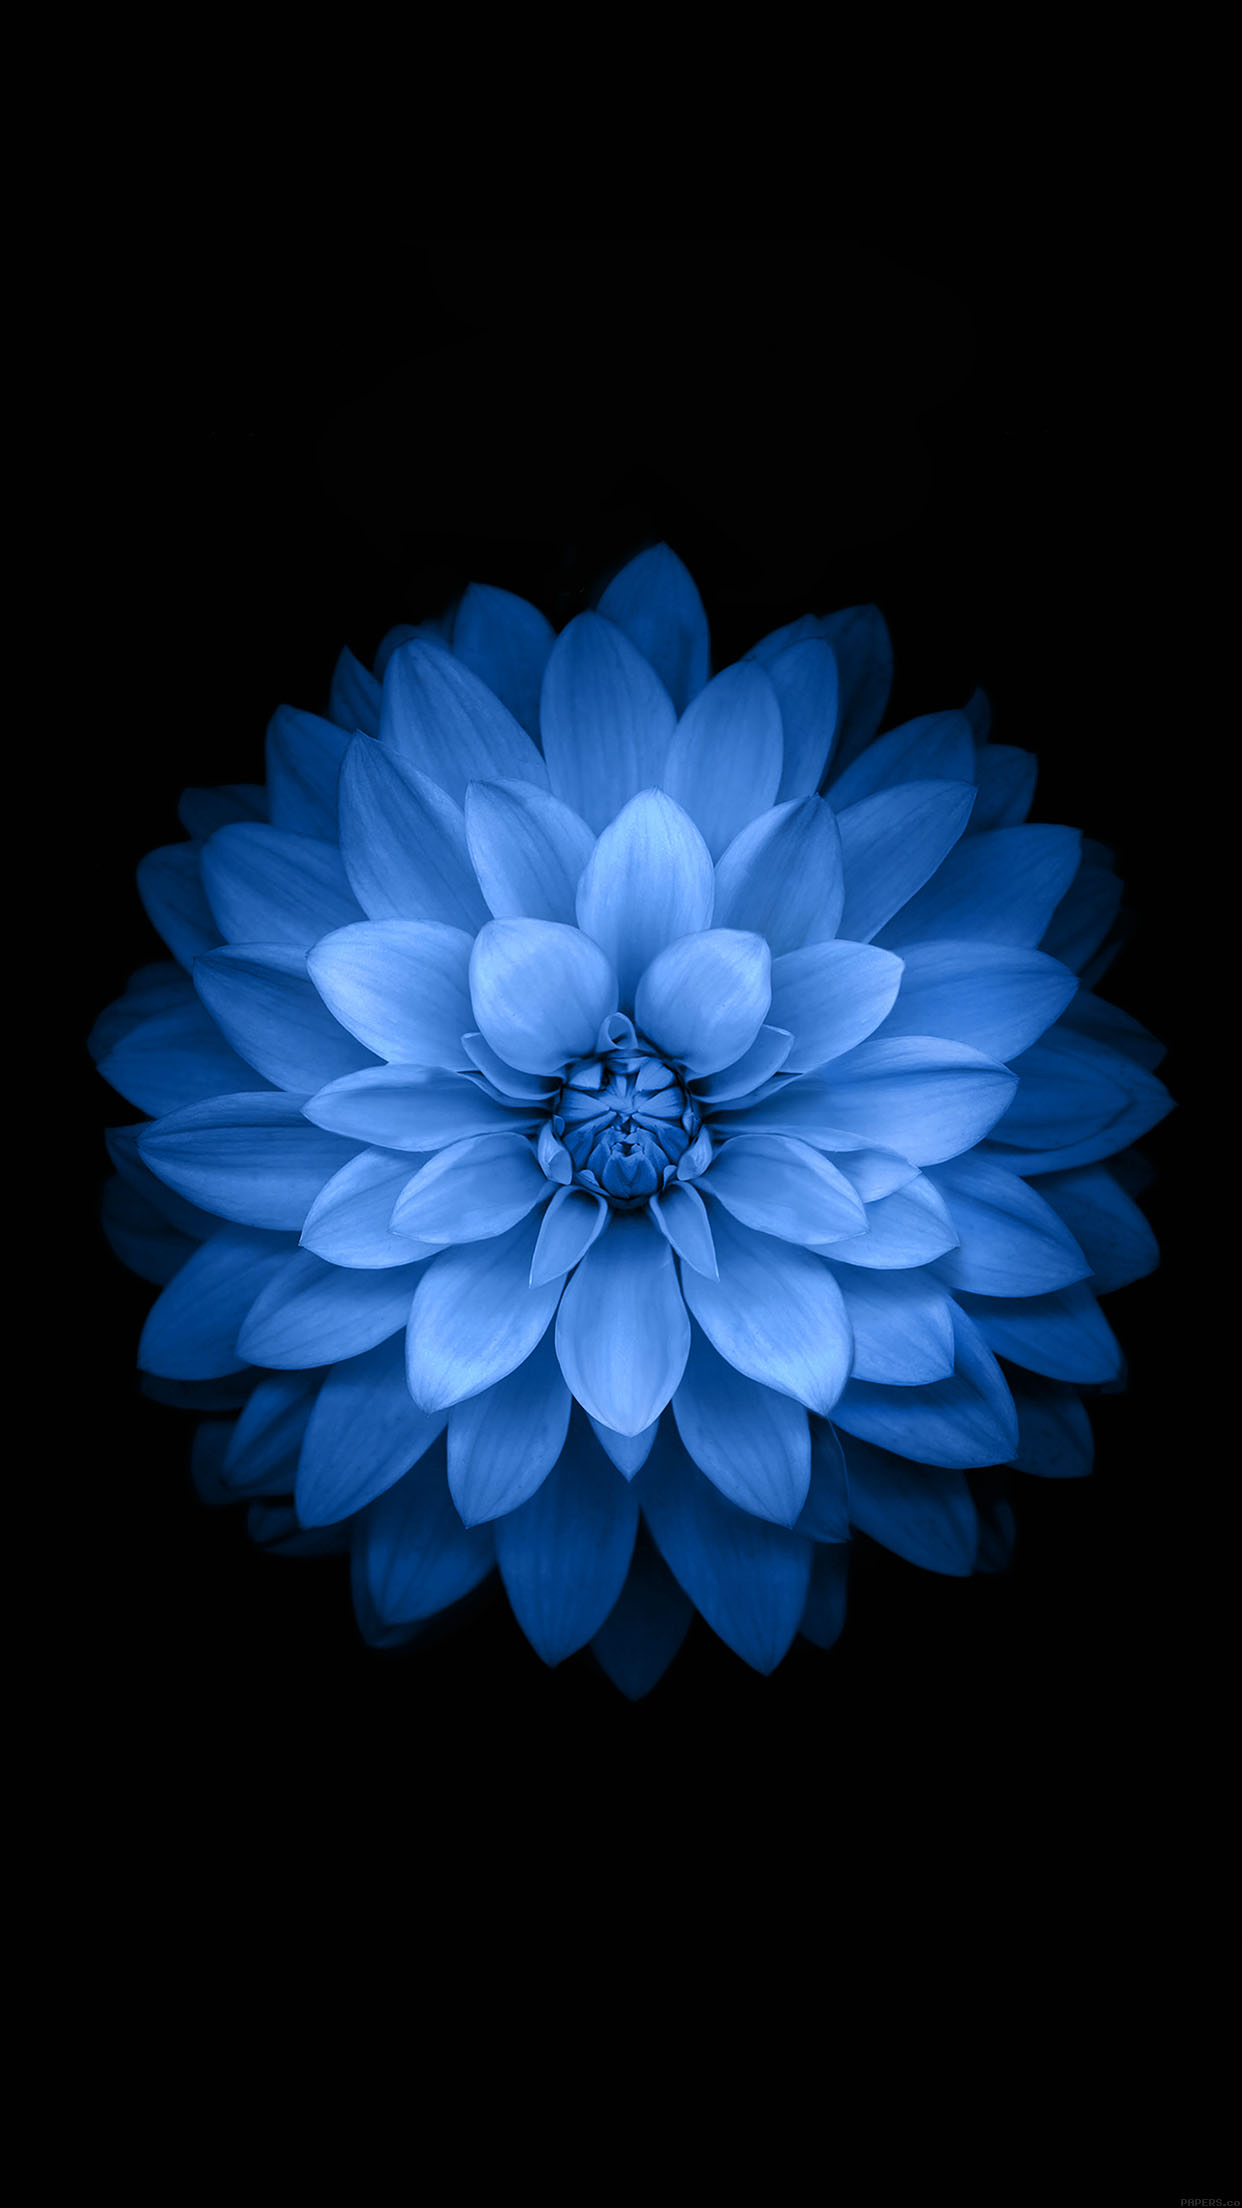 Ac99 Wallpaper Apple Blue Lotus Iphone6 Plus Ios8 Flower